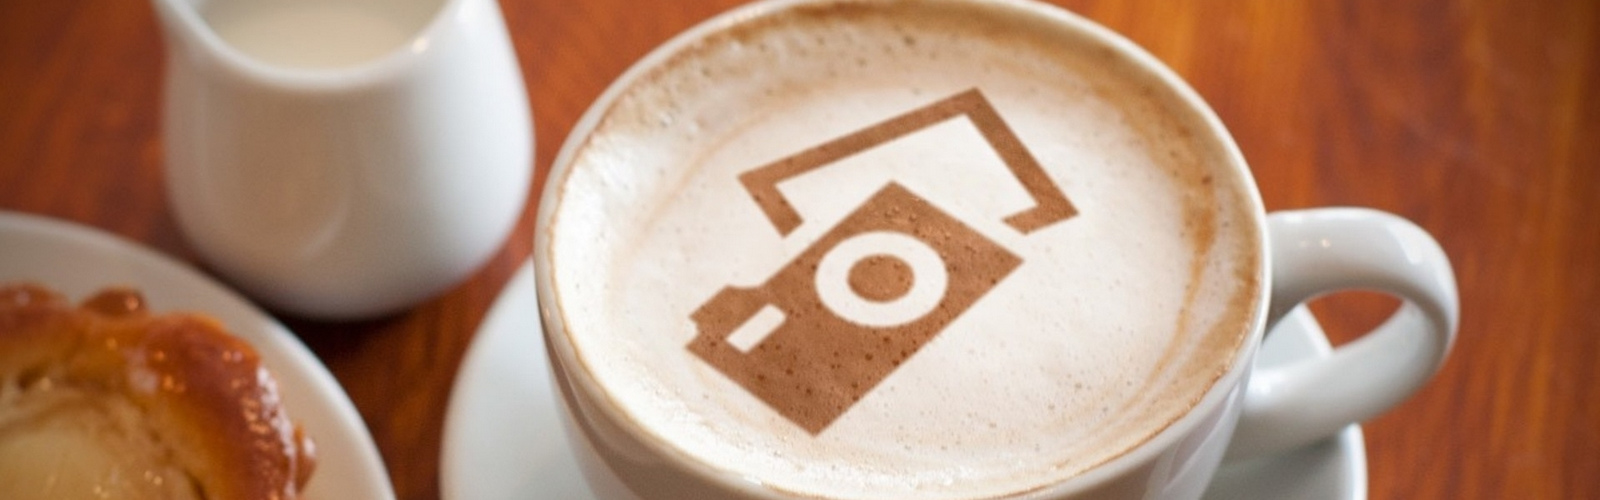 tasse café imprégnation appareil photo